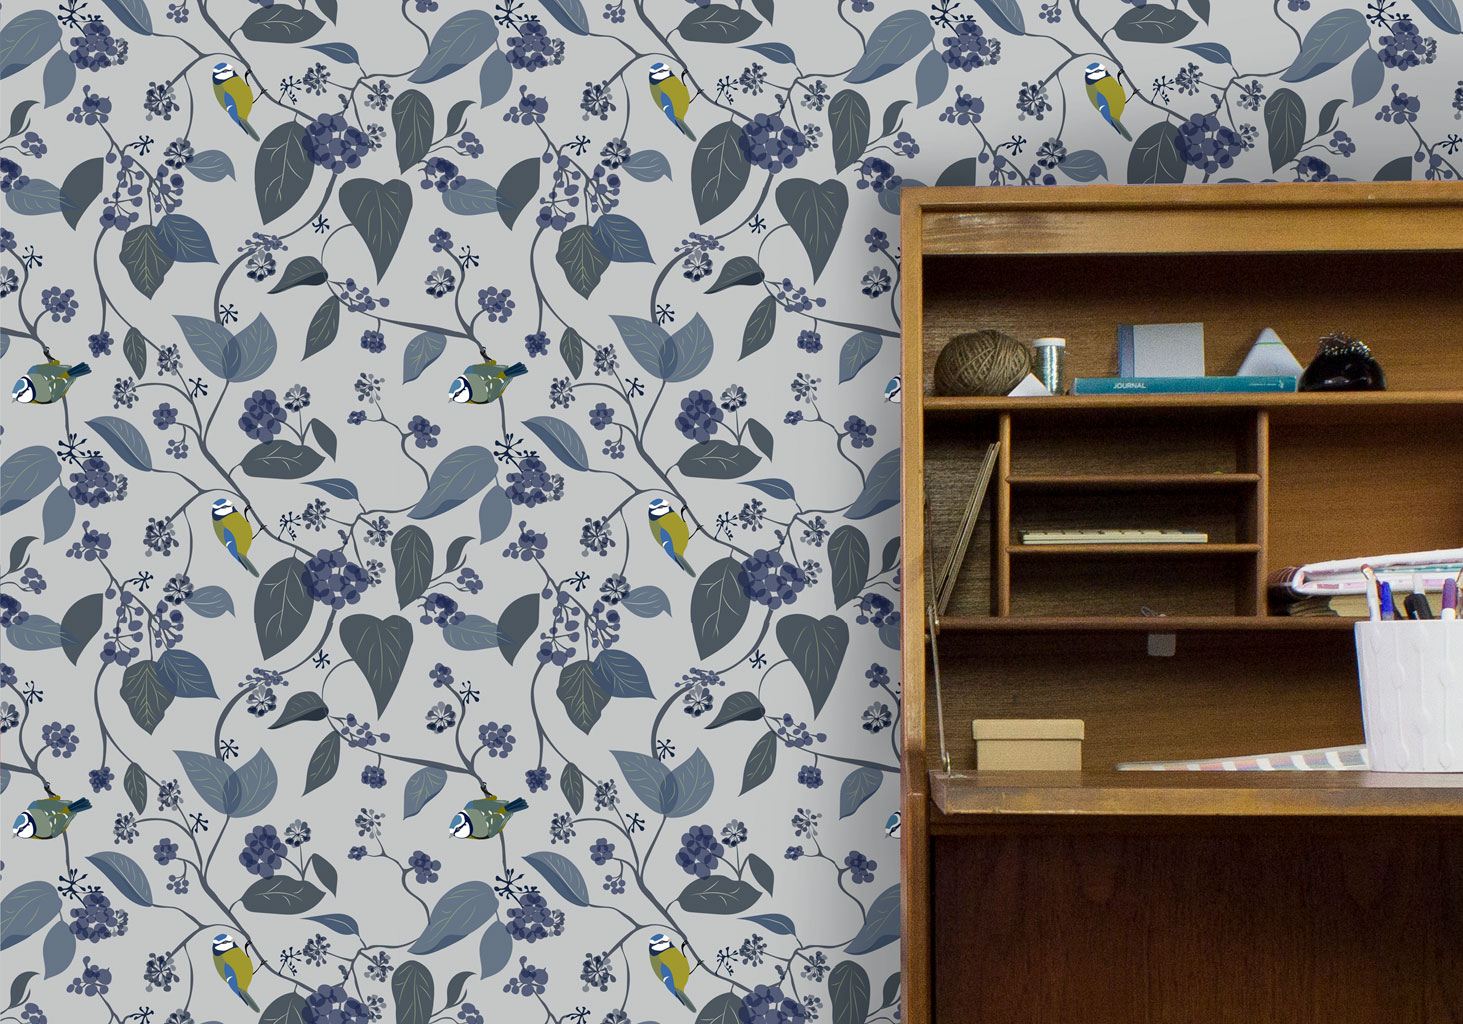 Great Tit Luxury Designer Wallpaper Handmade UK Designer Floral Fabrics Lampshades Interior Accessories Bespoke British Birds Wildlife Flowers